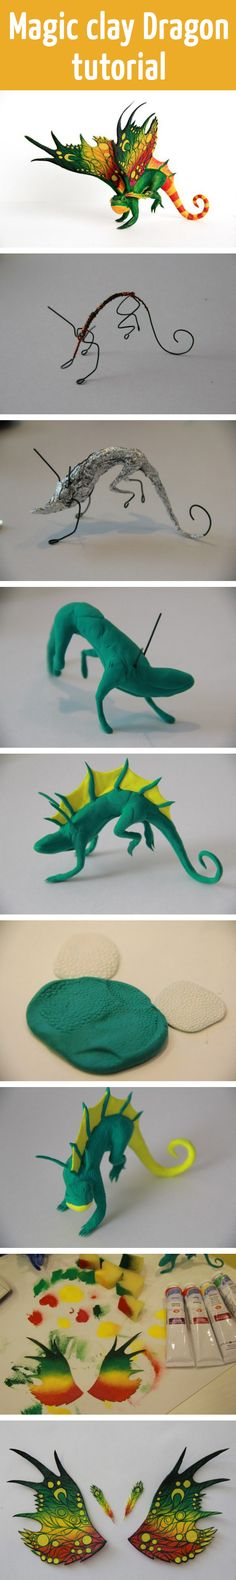 Magic clay Dragon tutorial